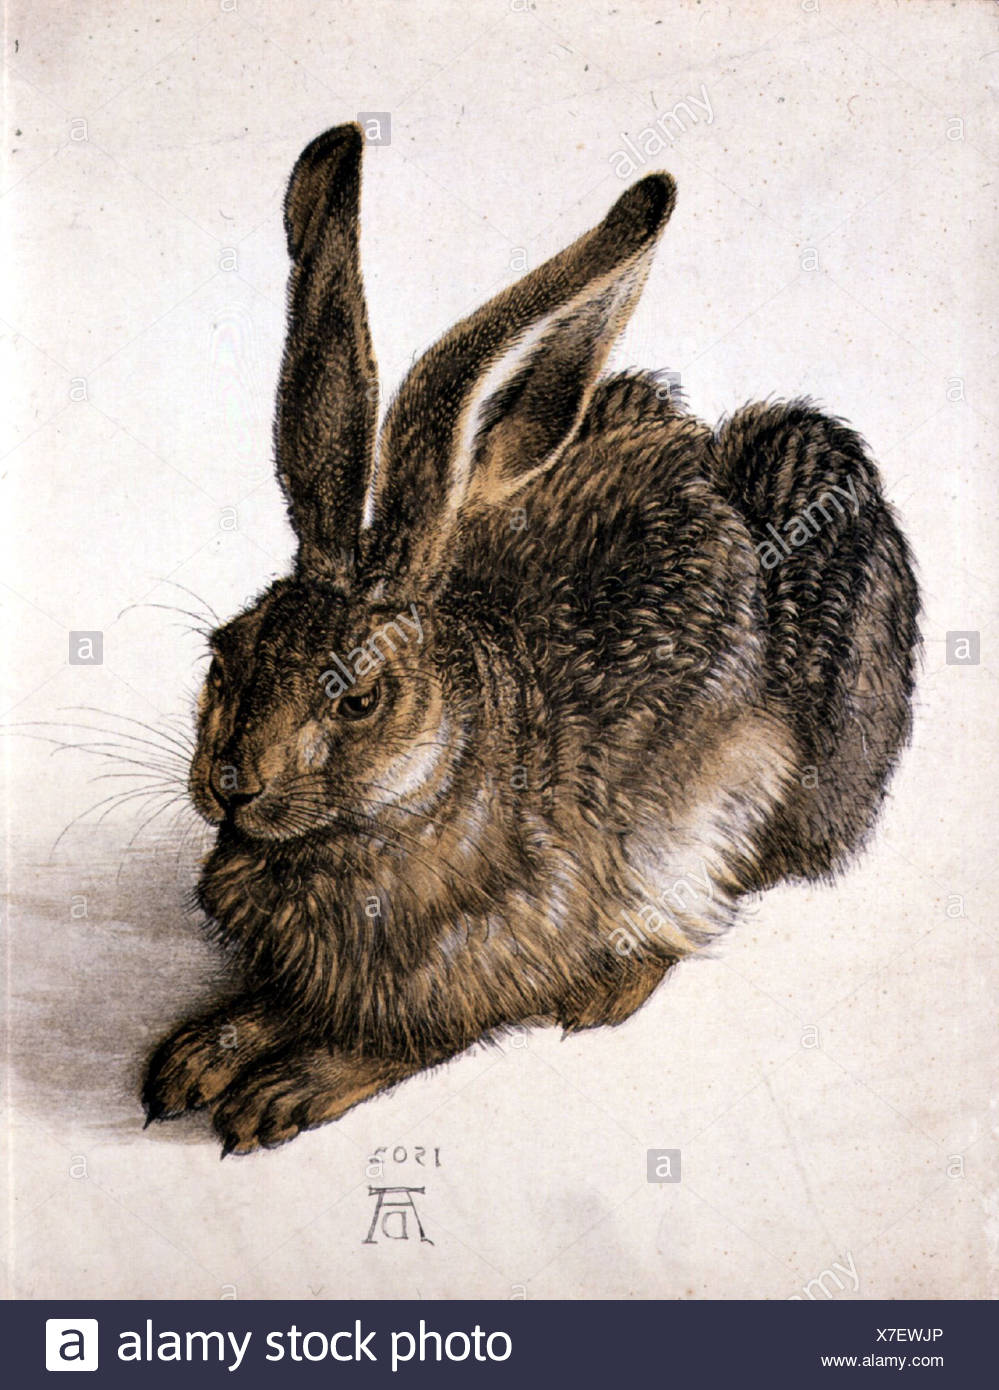 "Bildende Kunst, Dürer, Albrecht (1471-1528), ""Feldhase"" (Young Hare), Aquarell, 1502, Albertina, Wien, Österreich, Zoologie, Hase Stockbild"